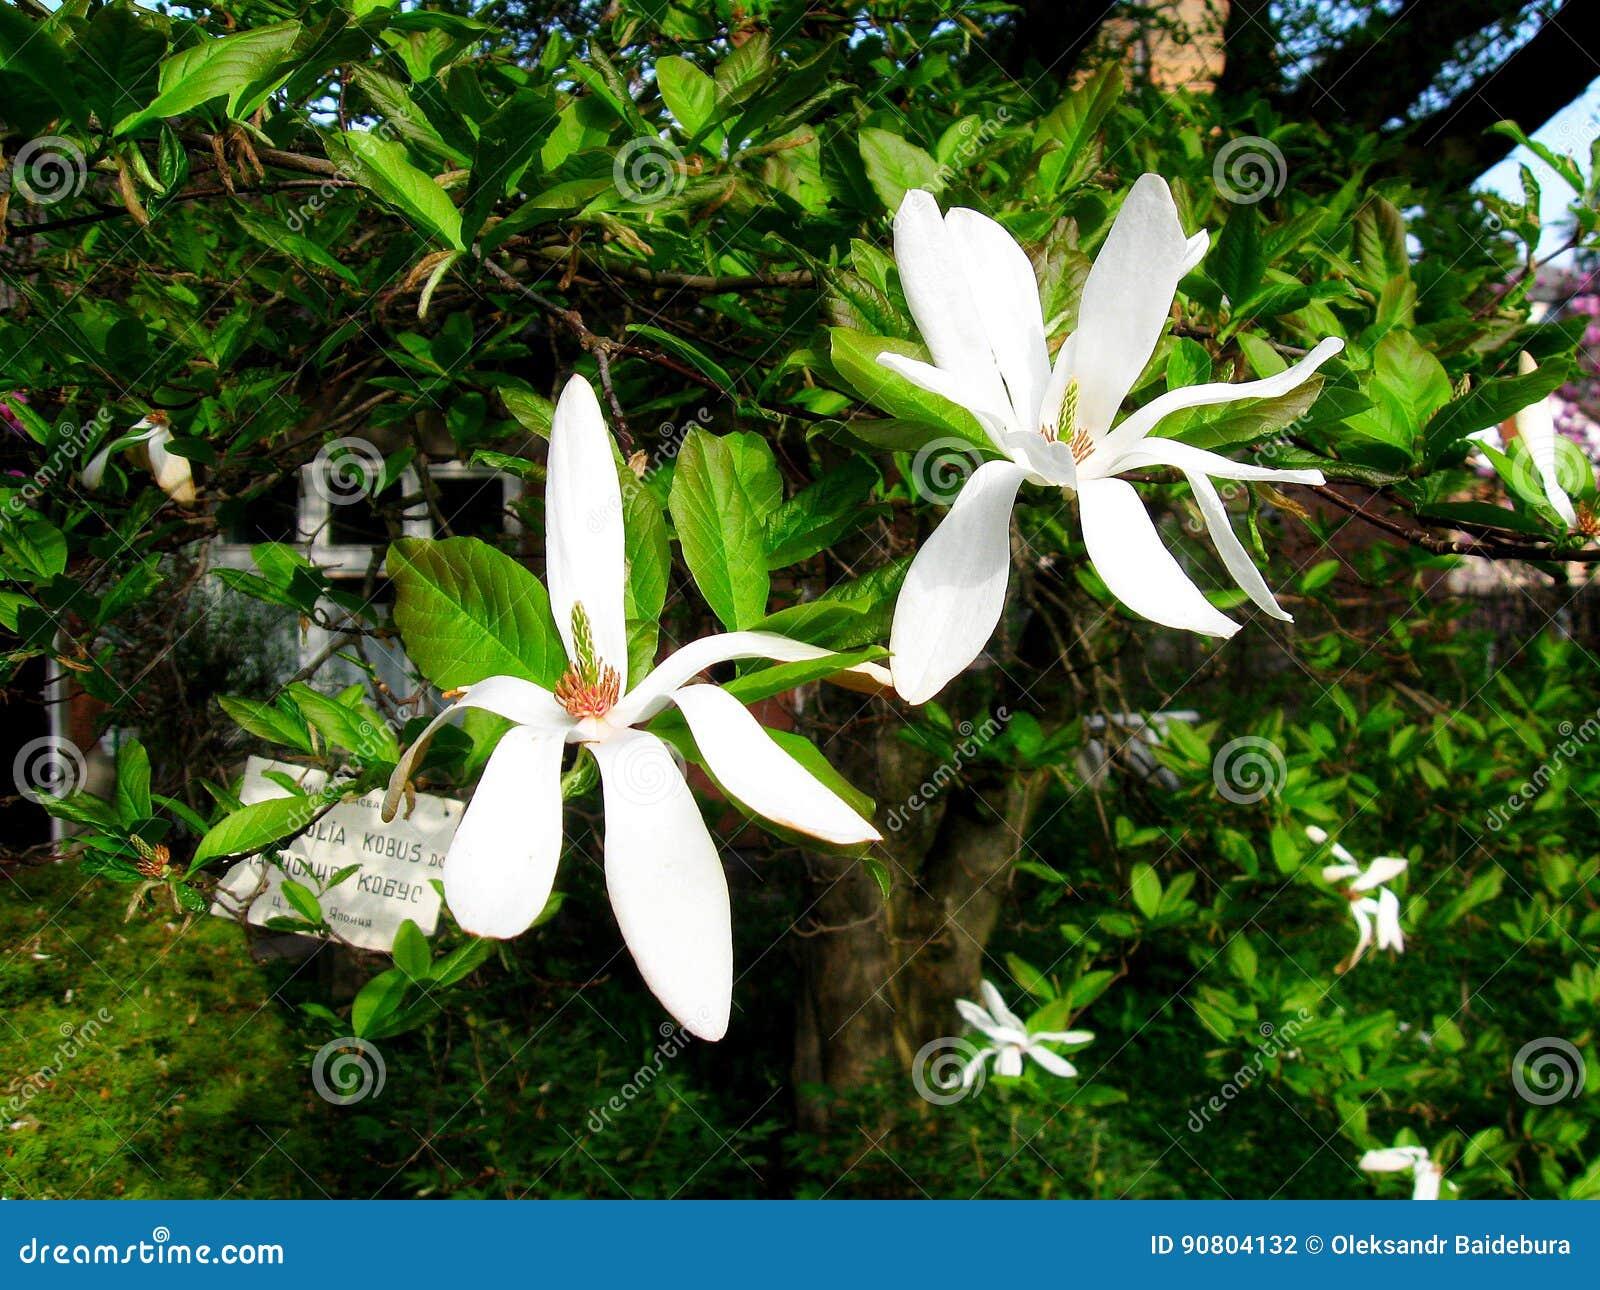 Bloomy Magnolia Tree With Big Whiteflowers Stock Photo Image Of